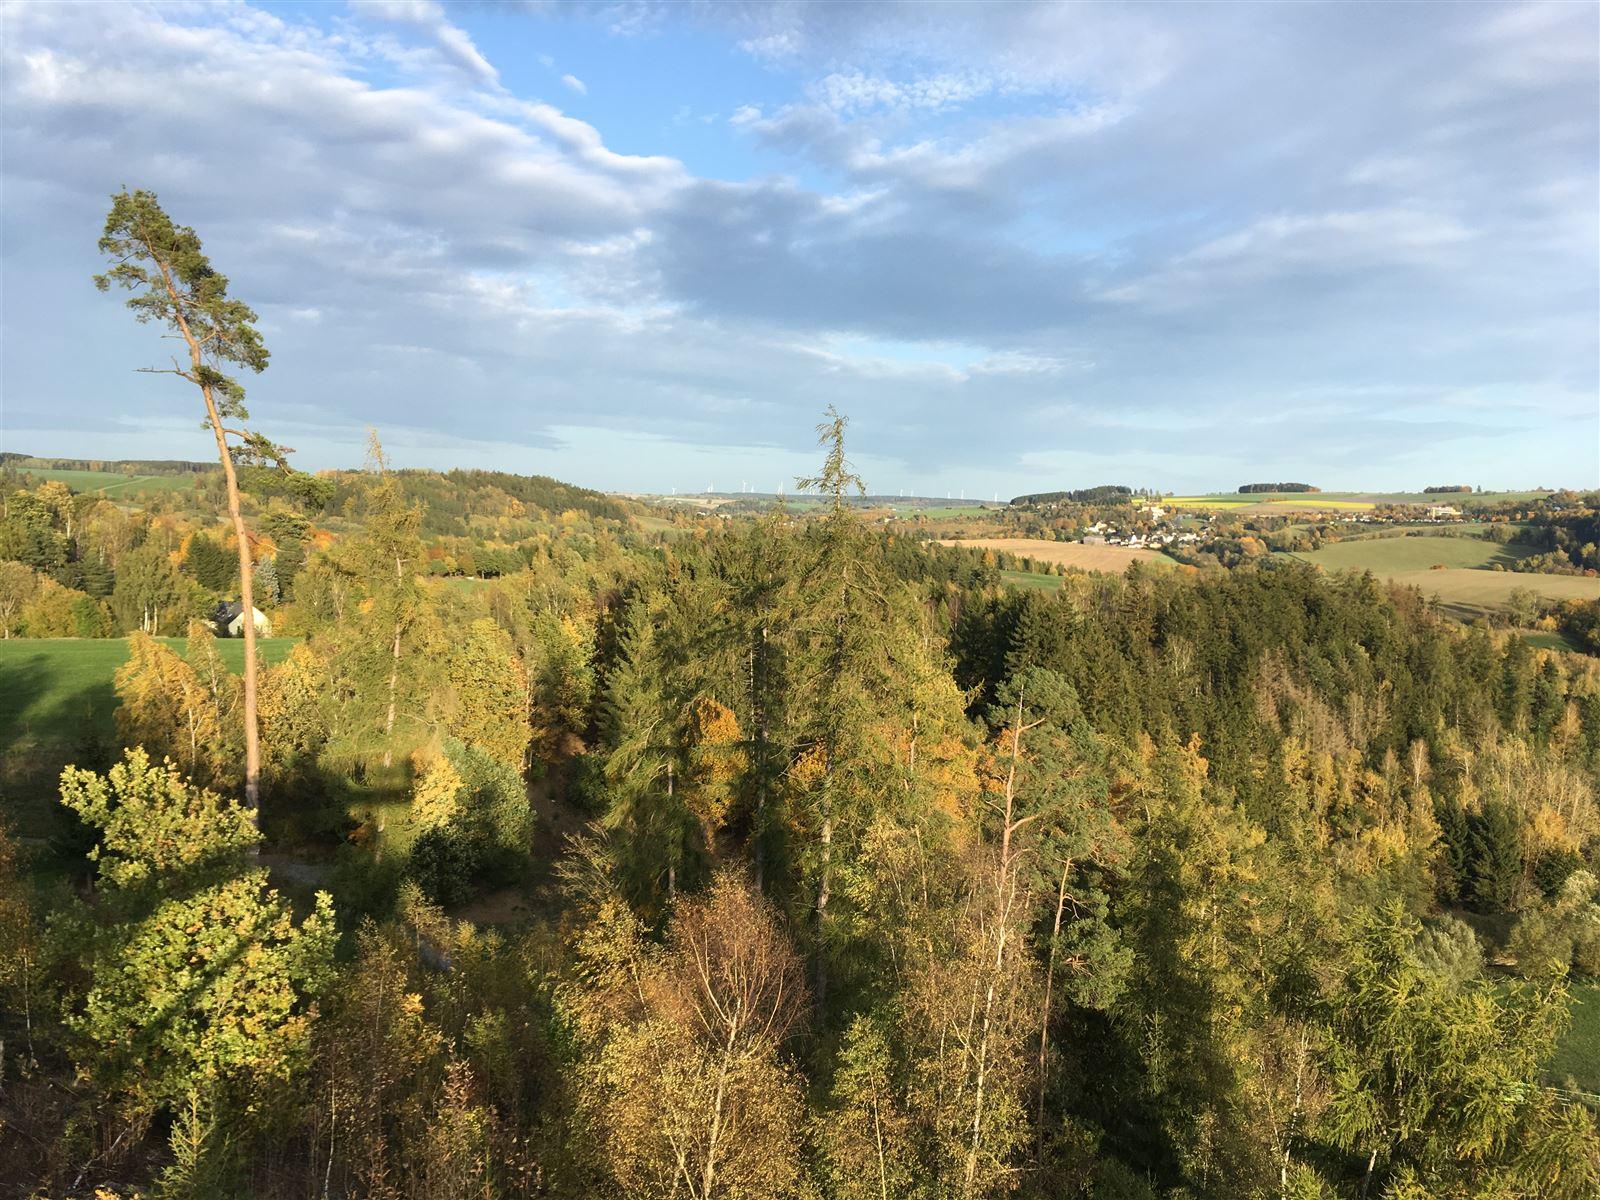 Blick ins Tal der Oberen Saale